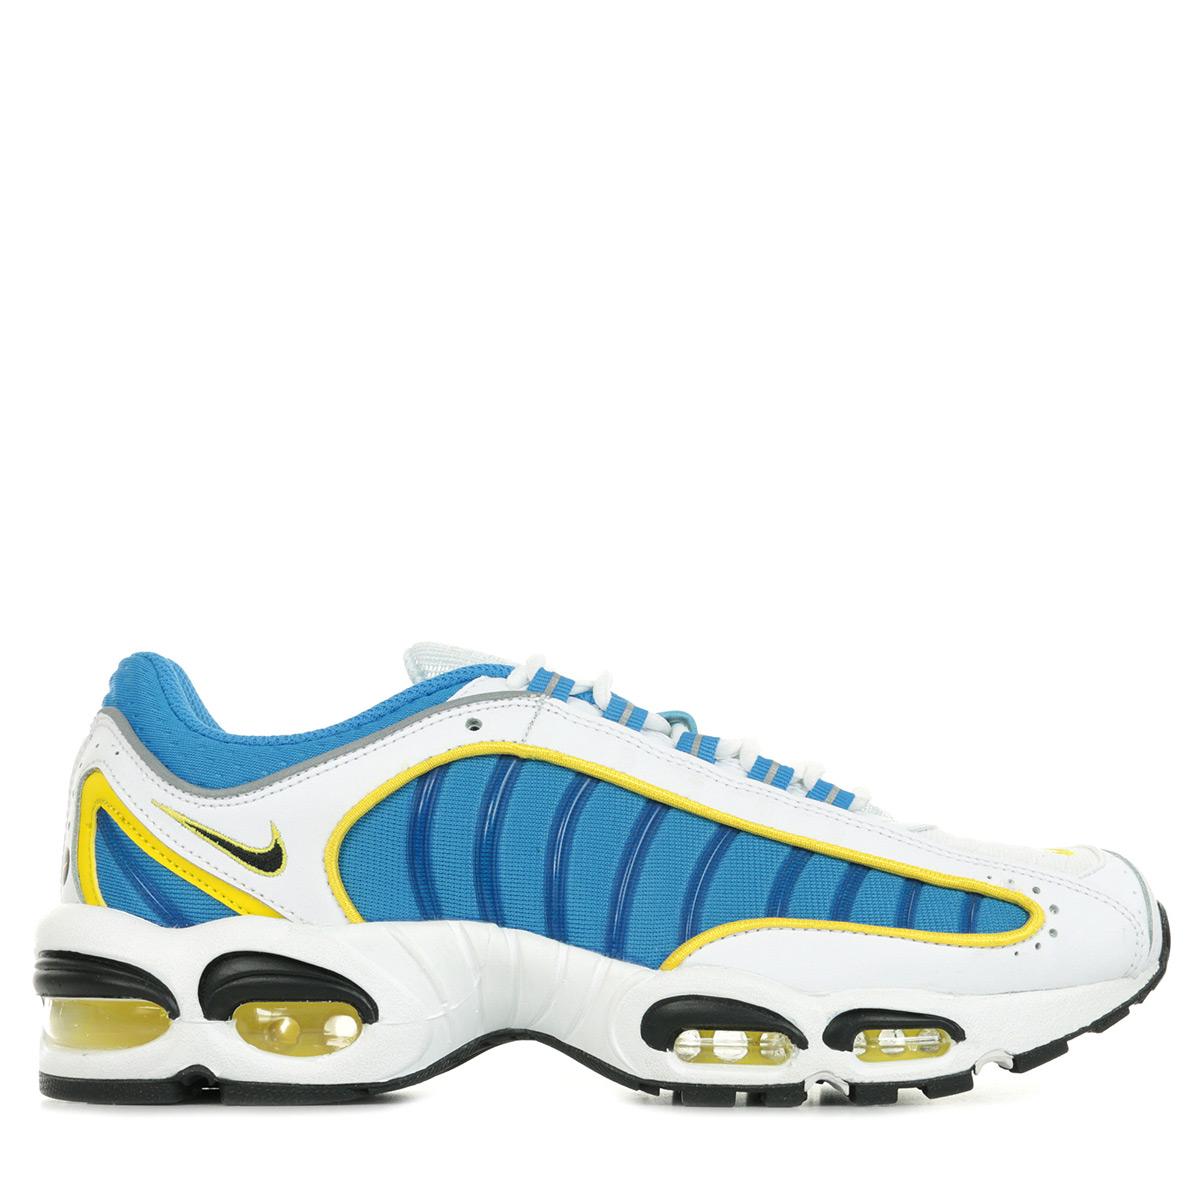 Détails sur Chaussures Baskets Nike homme Air Max Tailwind IV taille Blanc Blanche Cuir